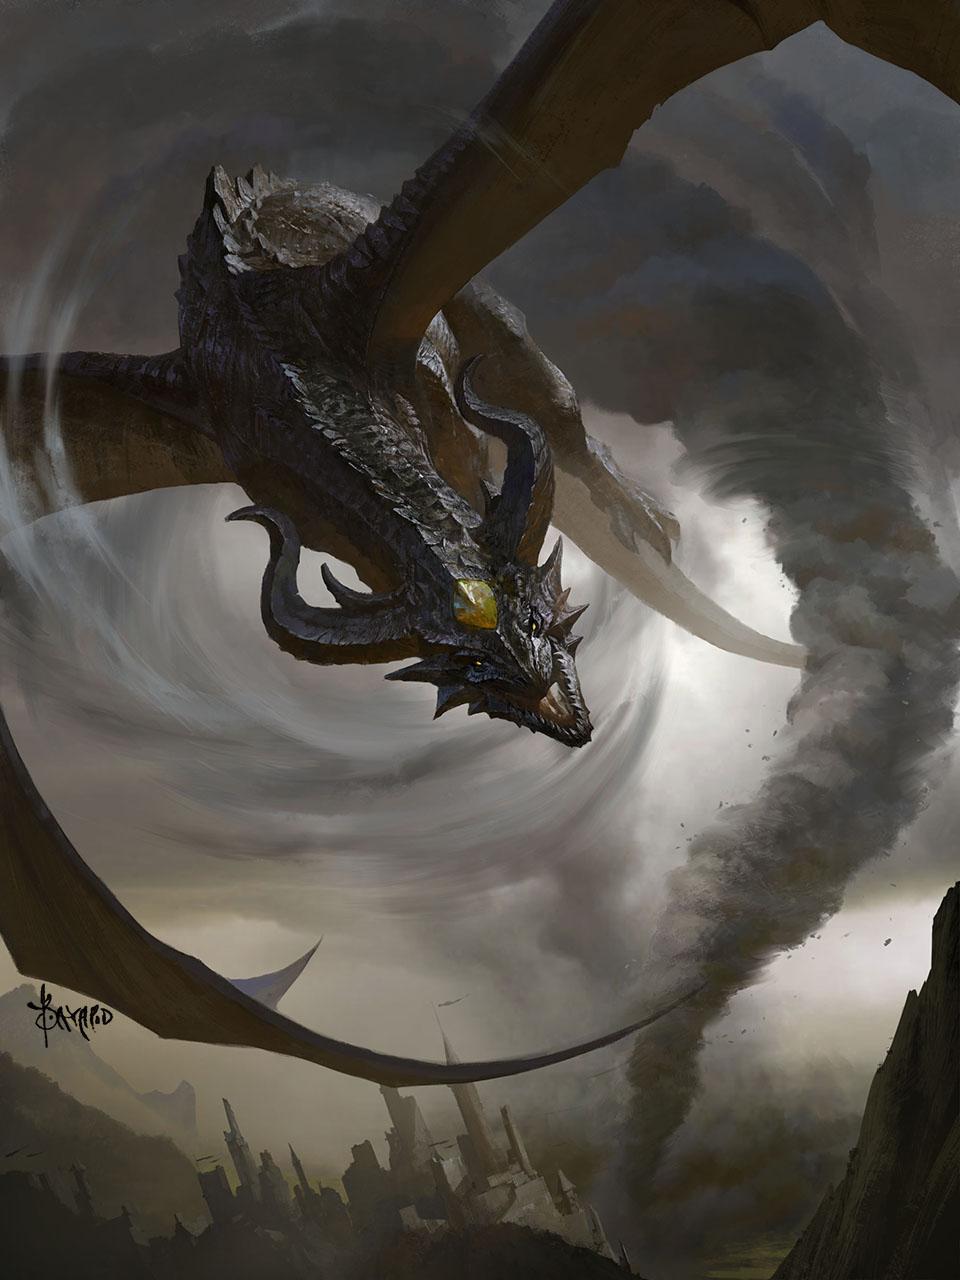 Storm Dragon by bayardwu on DeviantArt